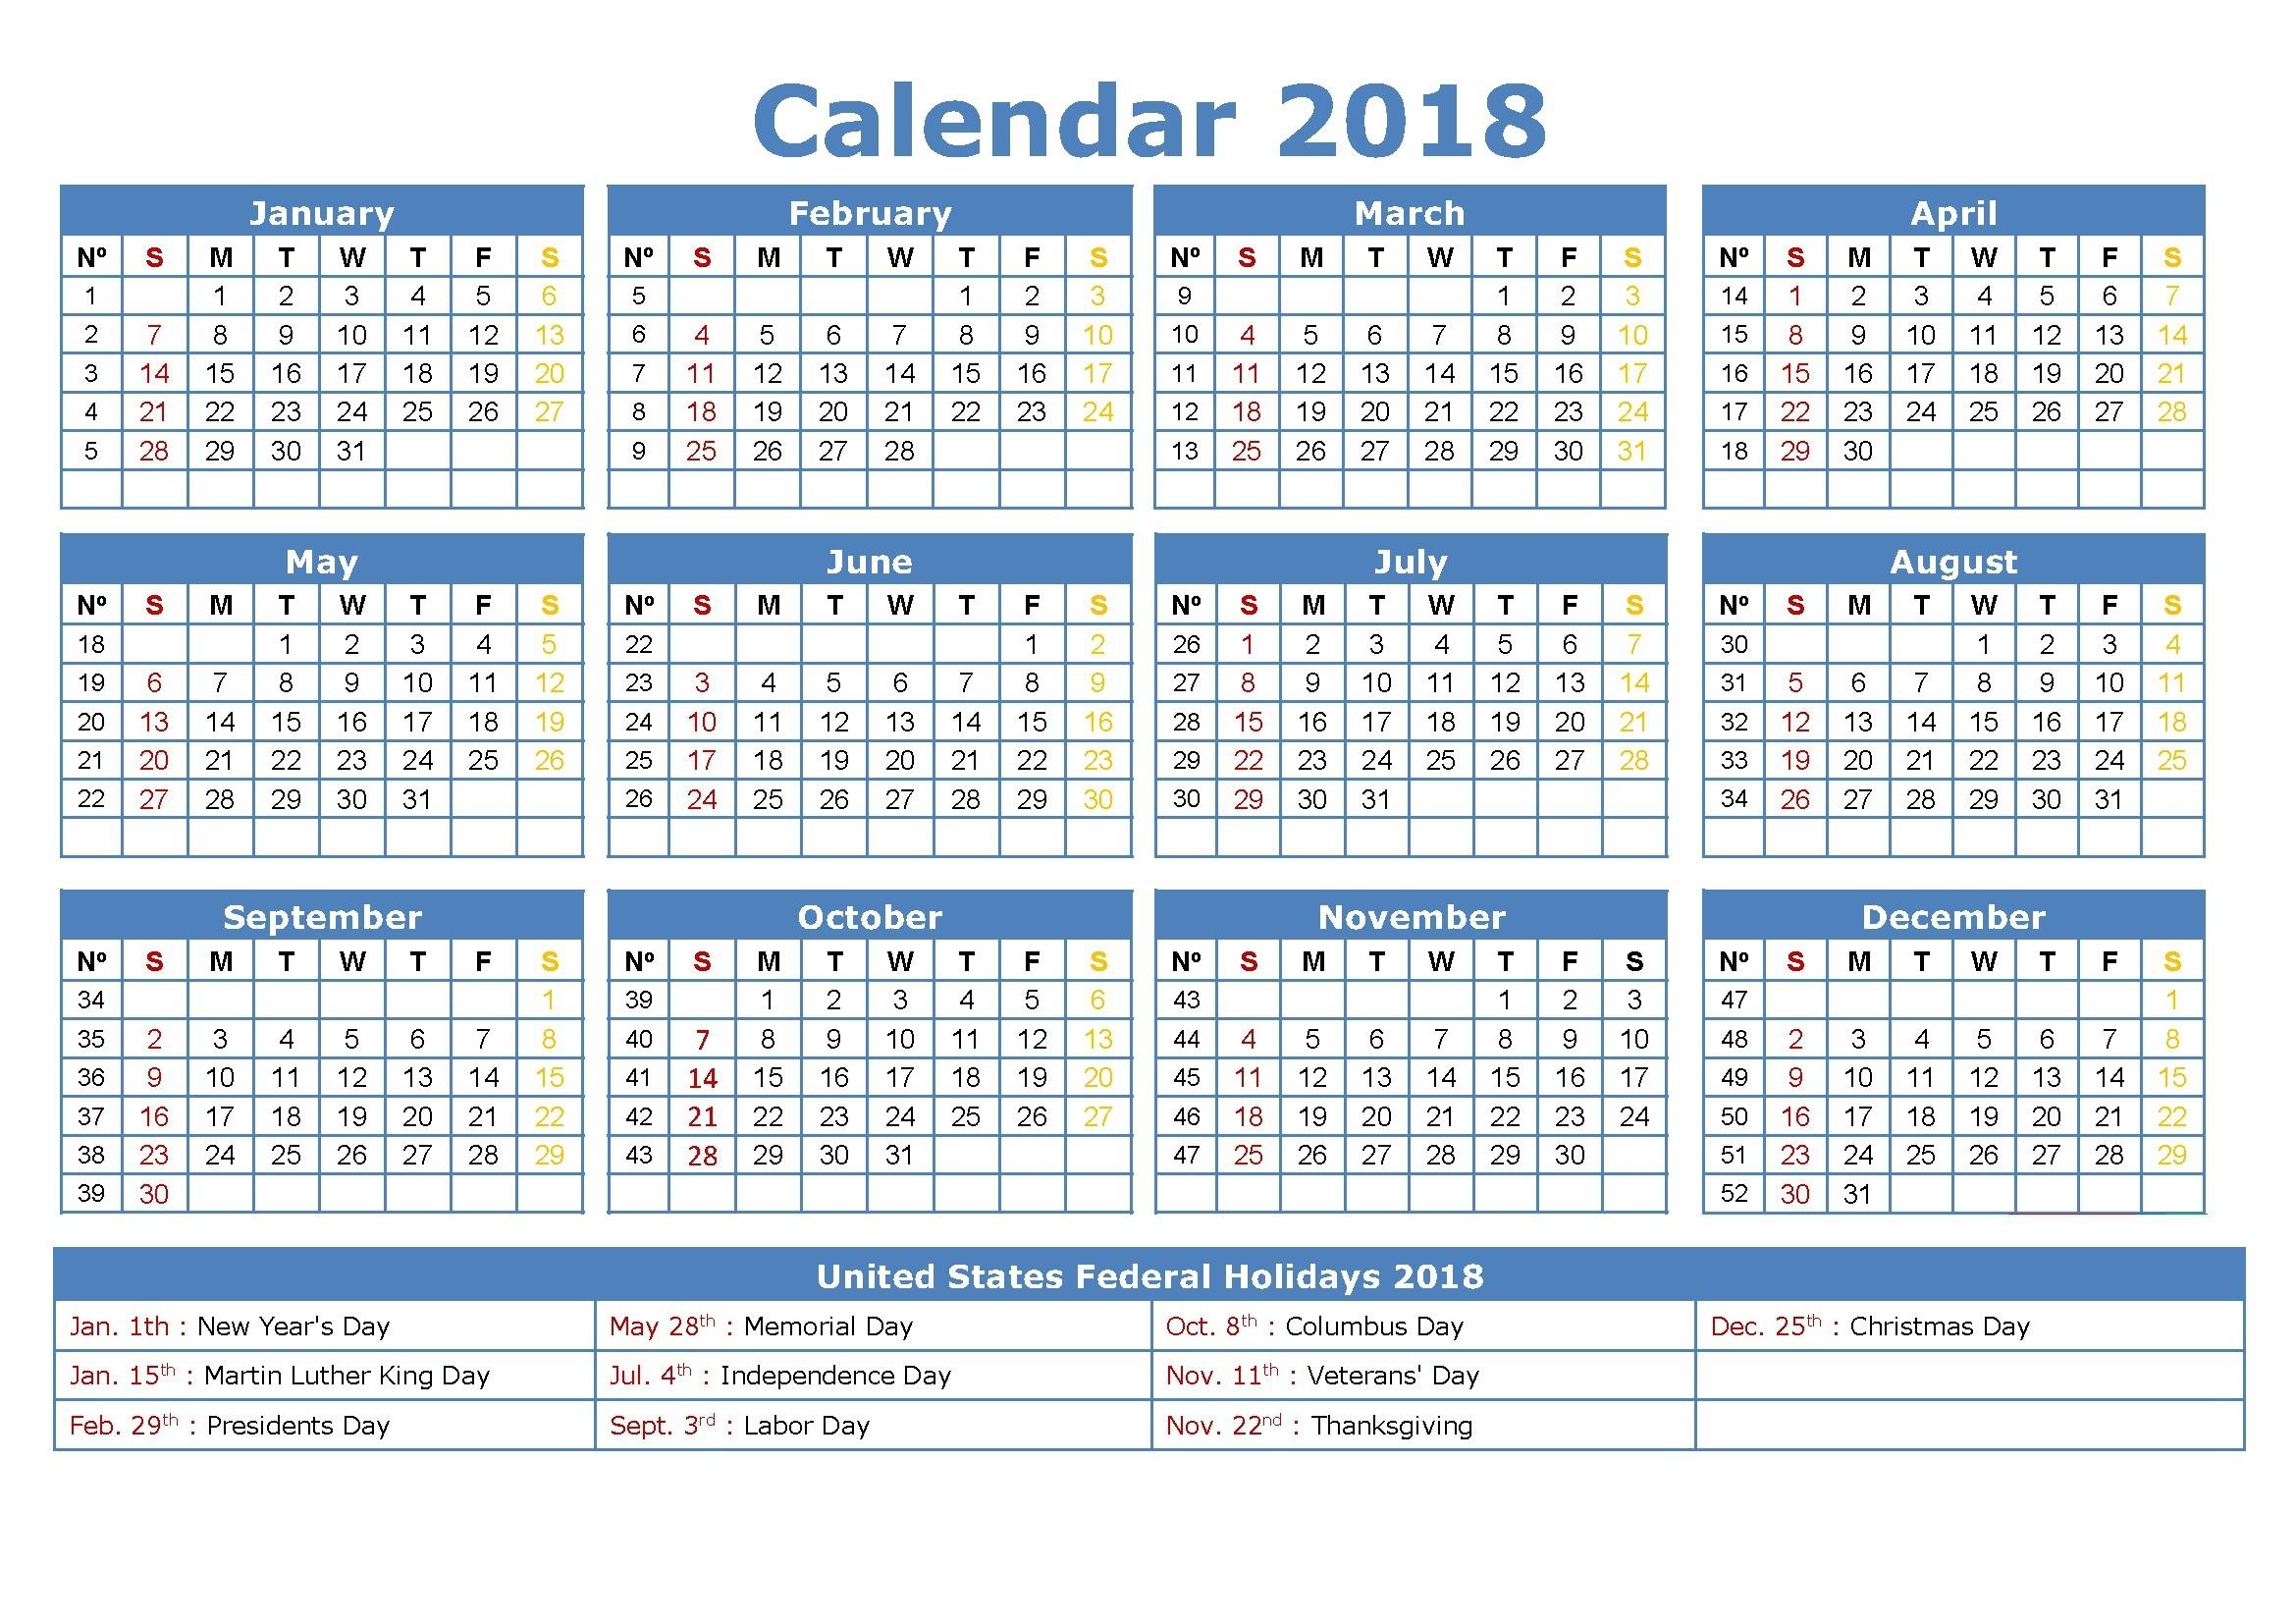 Free Printable Employee Attendance Calendar 2018 Yelom – Printable throughout Free Printable Employee Attendance Calendars